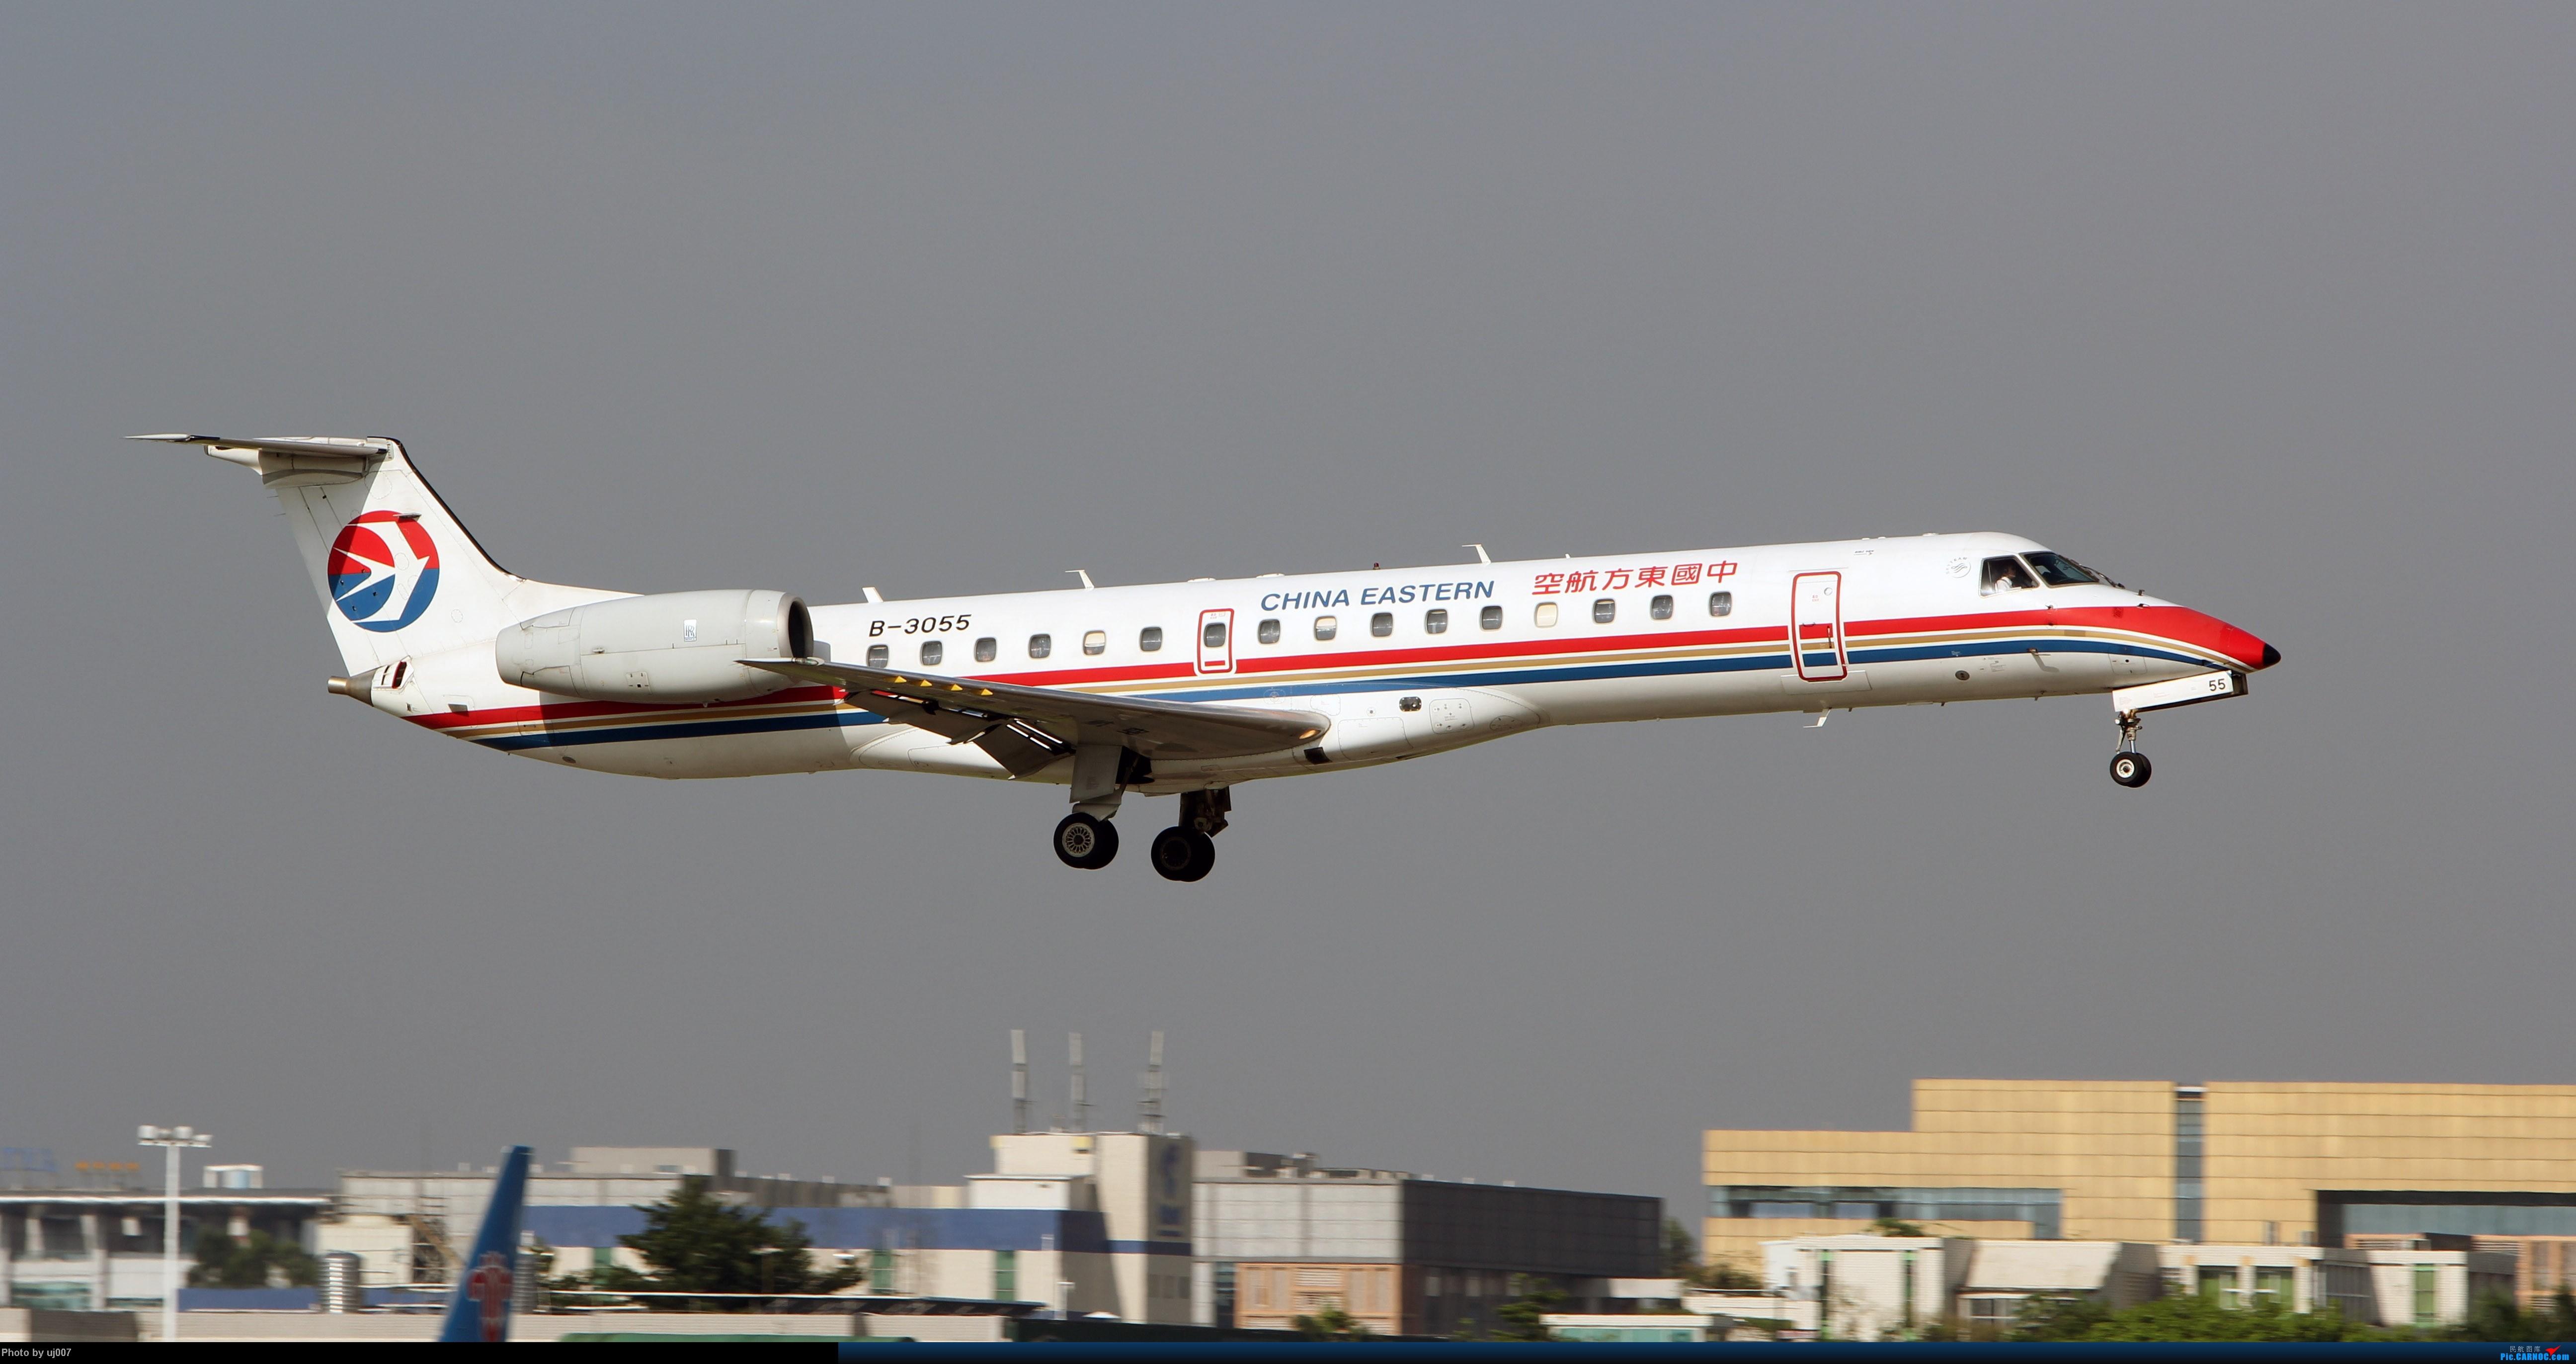 Re:[原创]10月2日白云拍机(大飞机,特别妆,外航,闪灯,擦烟)求指点. EMBRAER ERJ-145 B-3055 广州白云国际机场